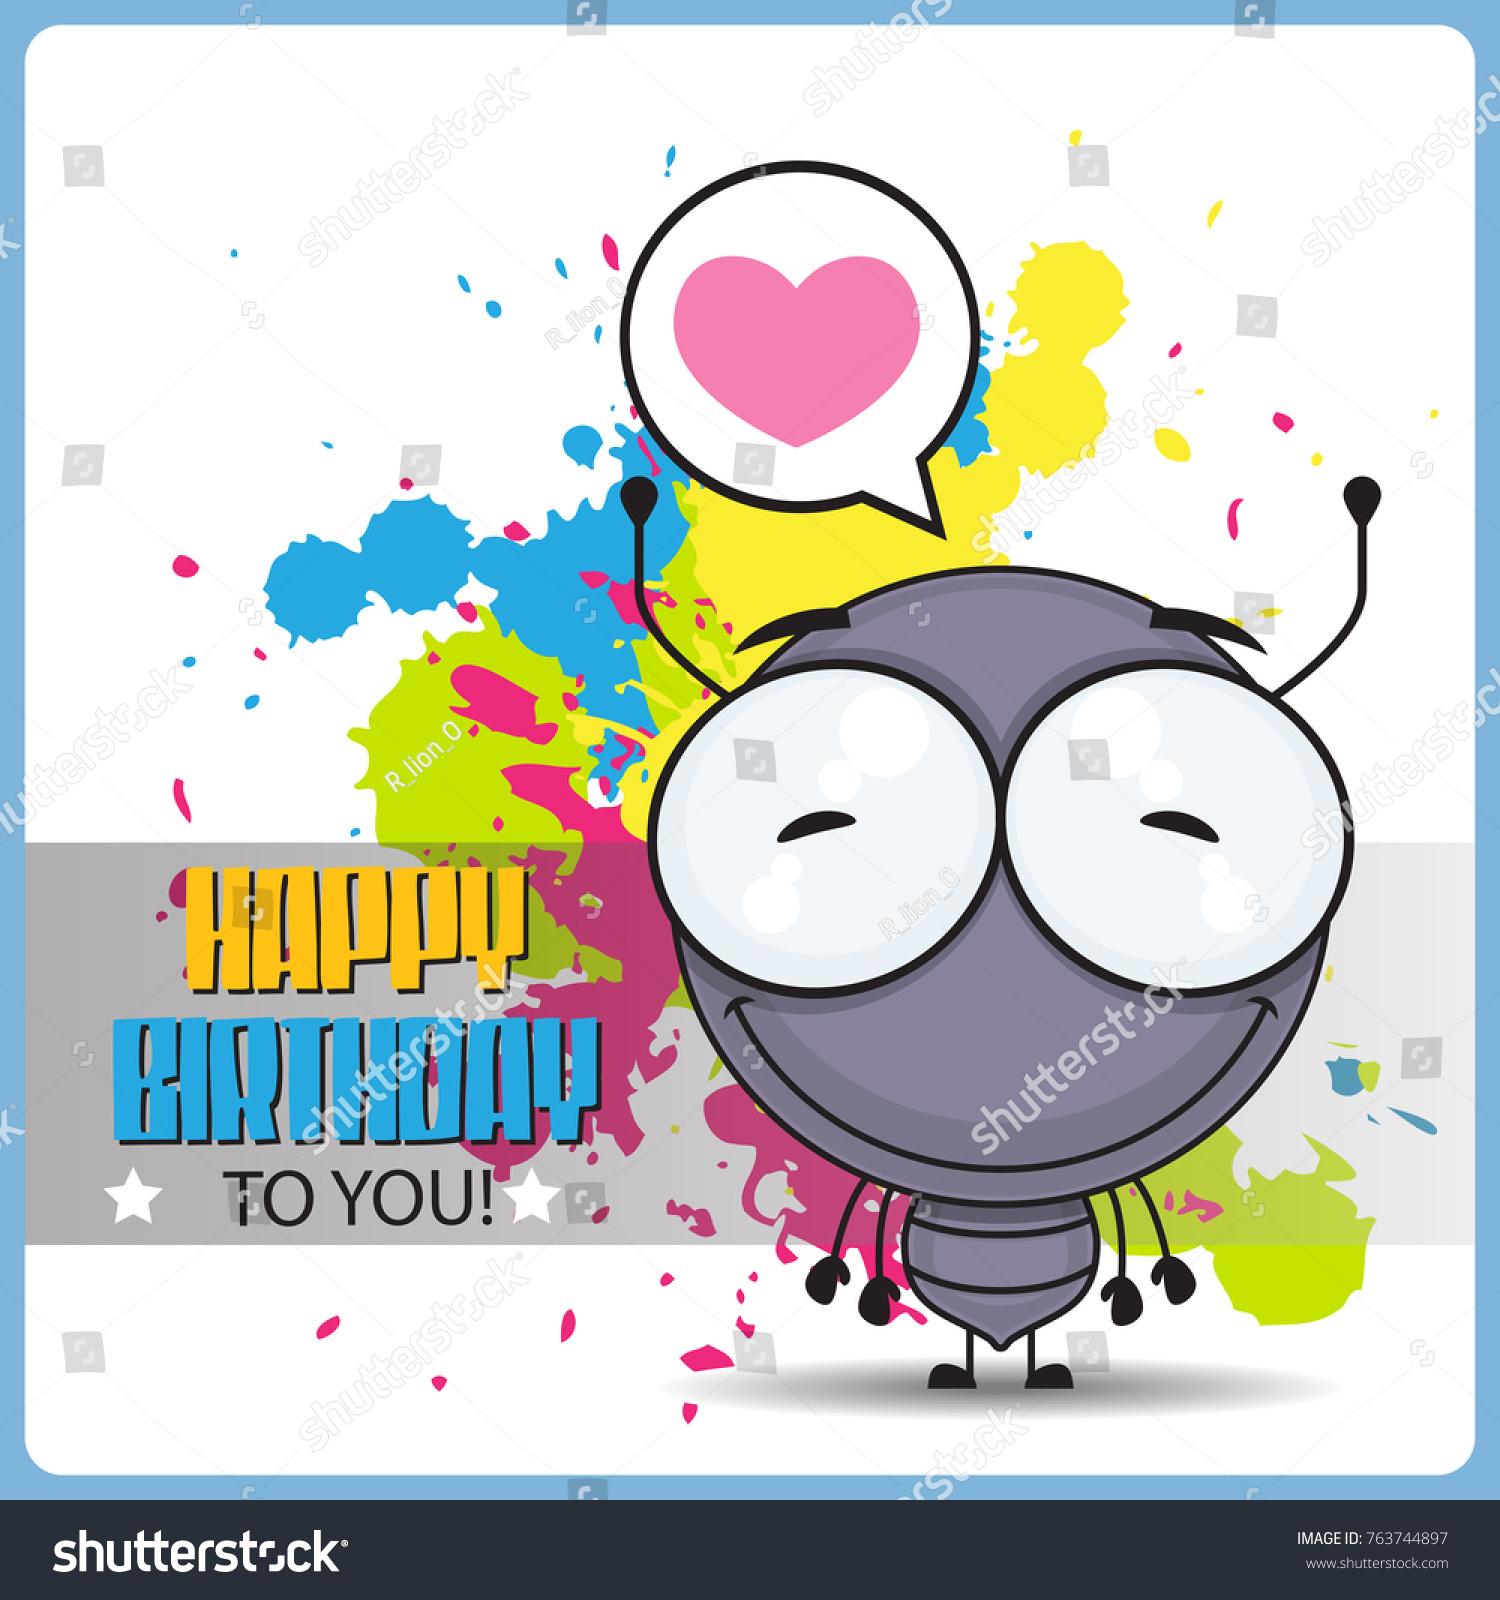 Funny happy birthday greeting card cartoon stock vector 763744897 funny happy birthday greeting card with cartoon ant character kristyandbryce Images